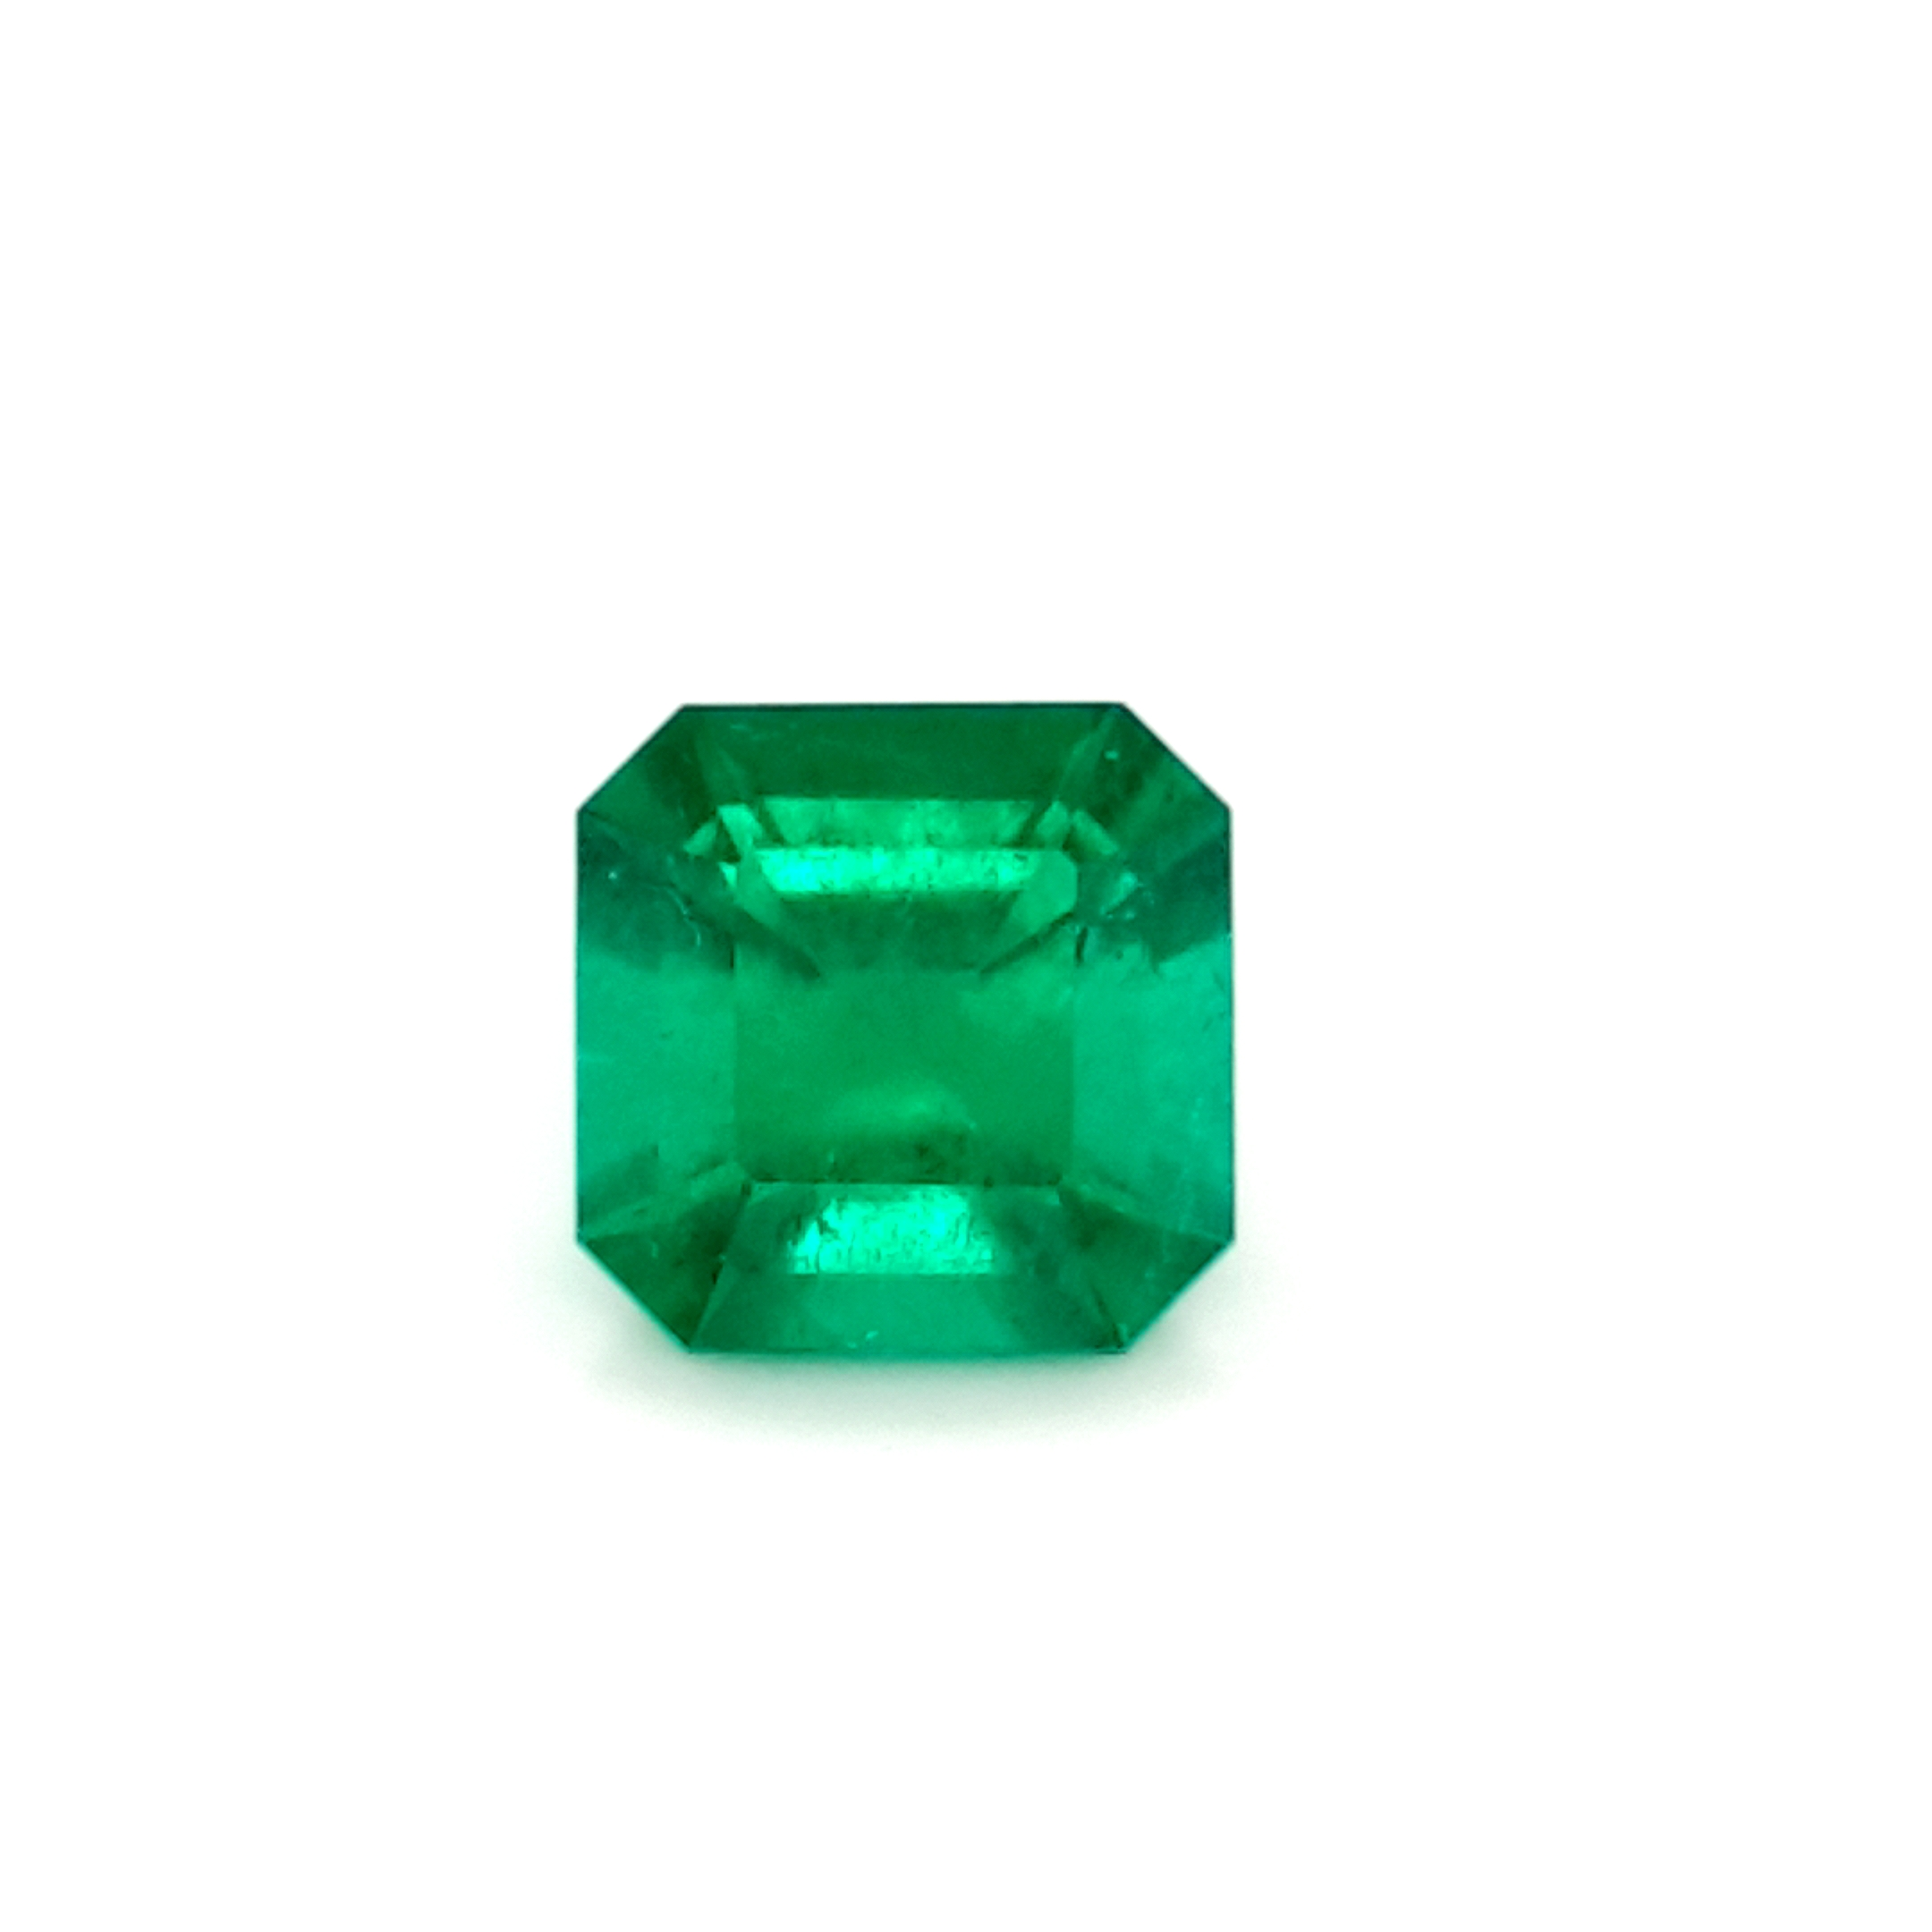 4,24 ct. Emerald from Colombia MuzoGreen cert. EMI20C17 ClaudiaHamann__2021-03-25-17-35-27